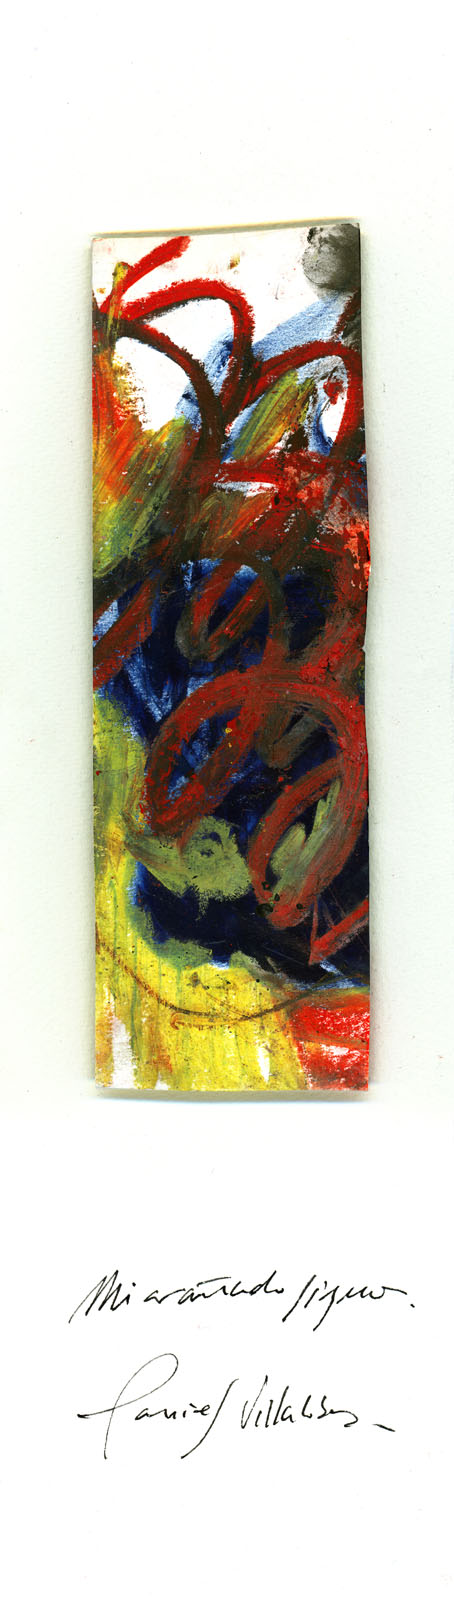 panies-danielvillalobos-spanish-painting-abstractexpressionism-20